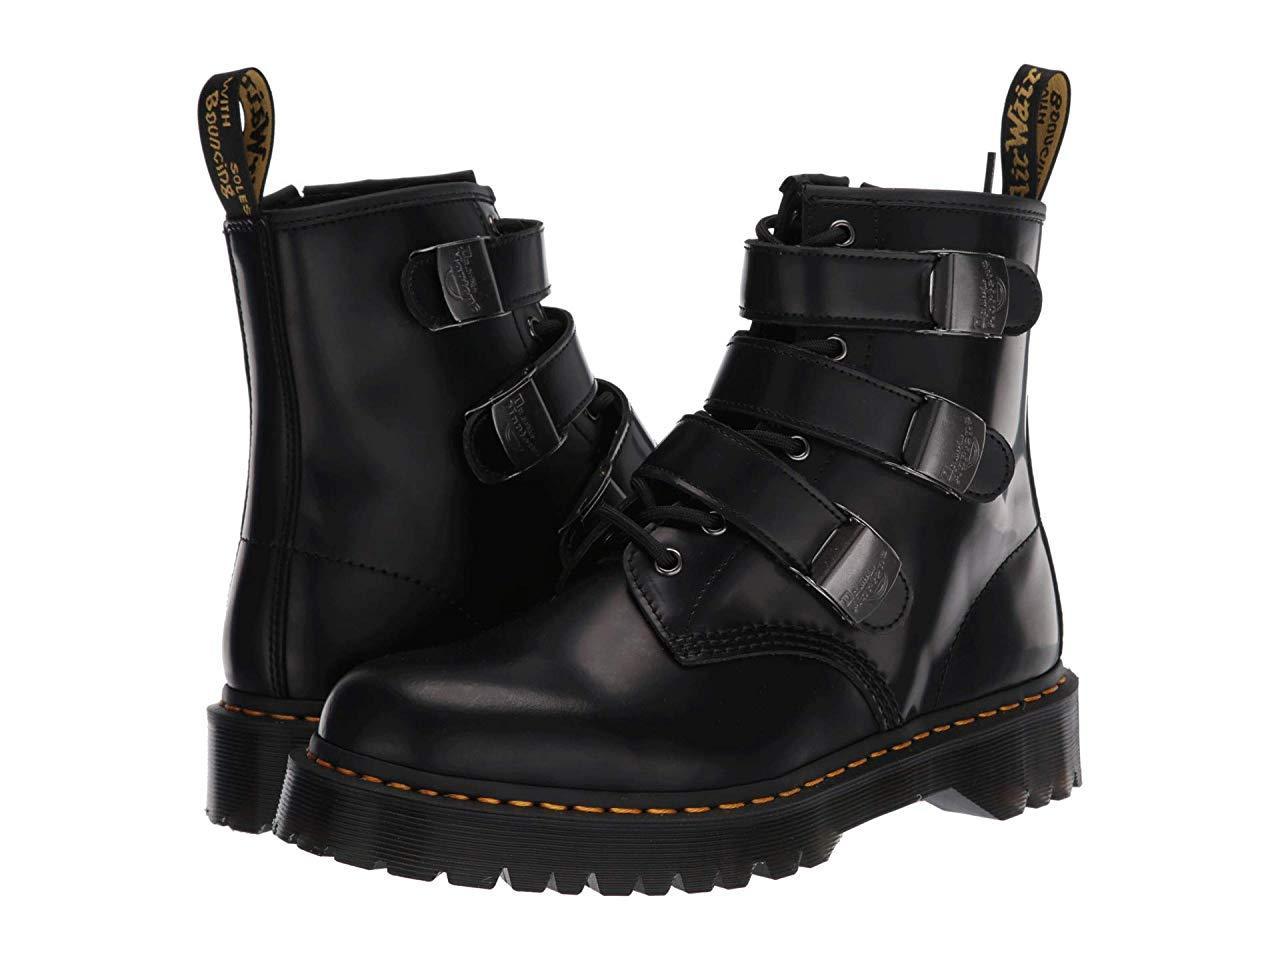 Ботинки/Сапоги (Оригинал) Dr. Martens 1460 Fenimore Bex Moto Black